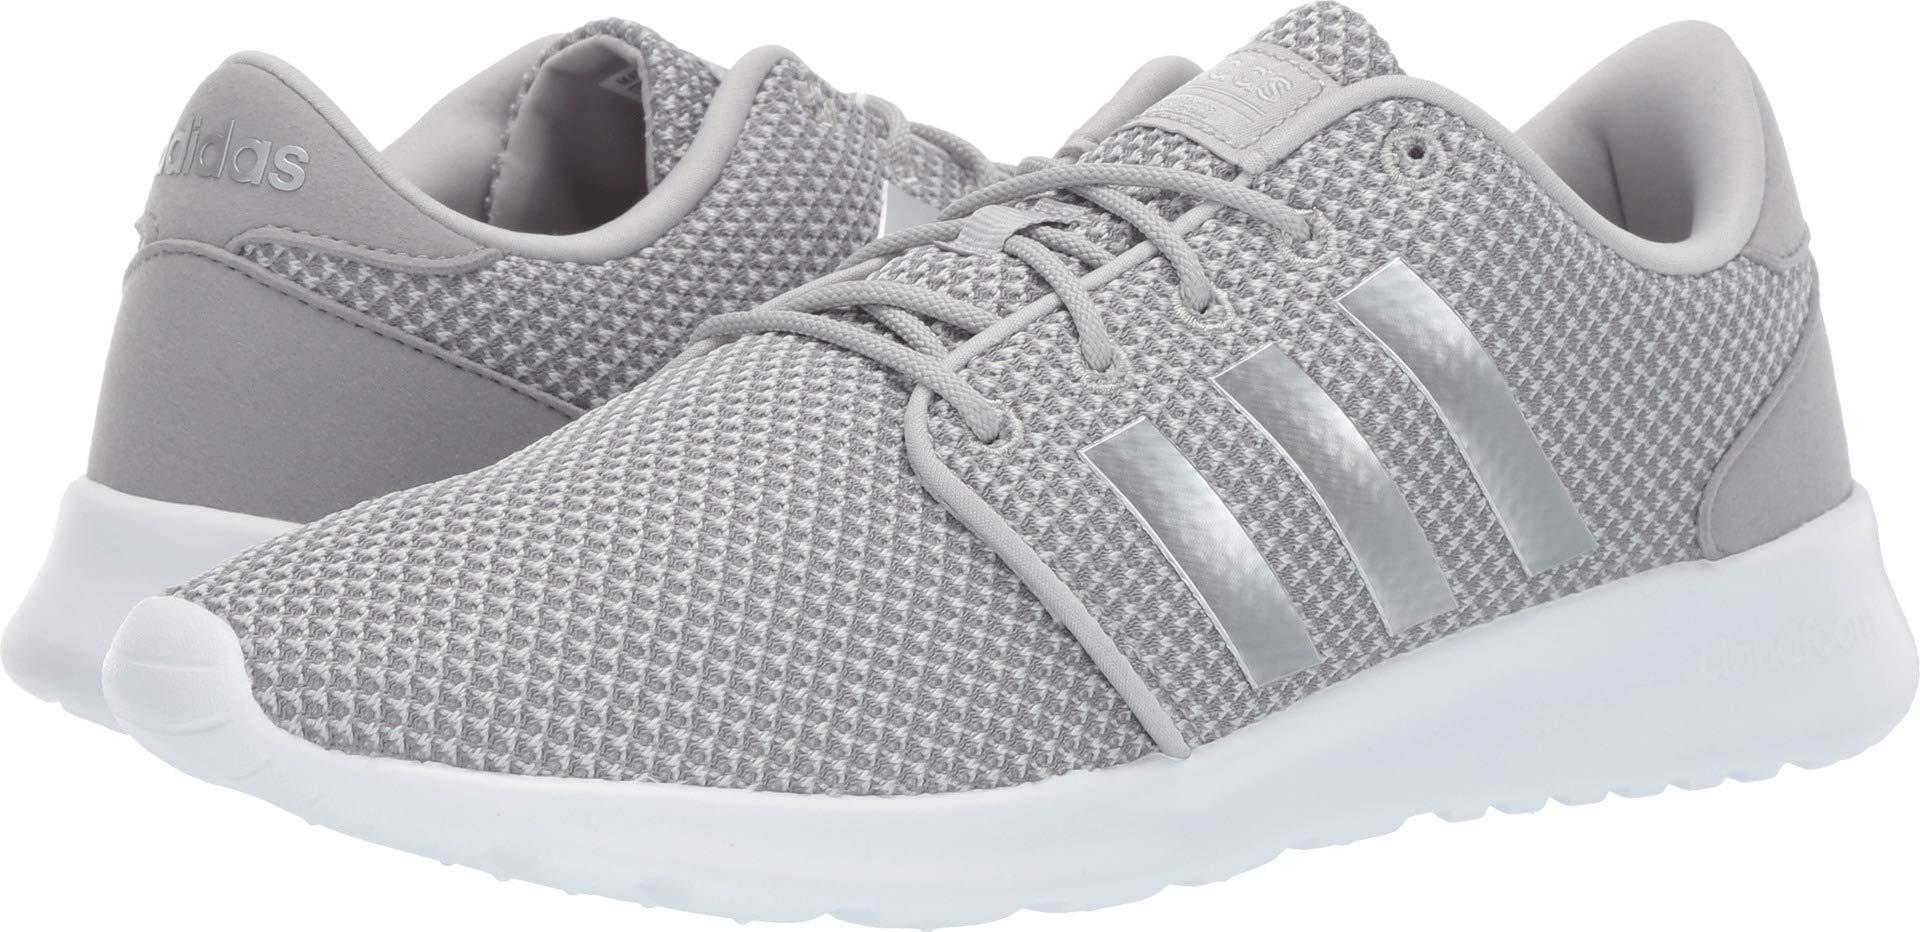 adidas Women's Cloudfoam QT Racer Shoes, Light Granite/Silver Metallic/Grey, 8.5 M US by adidas